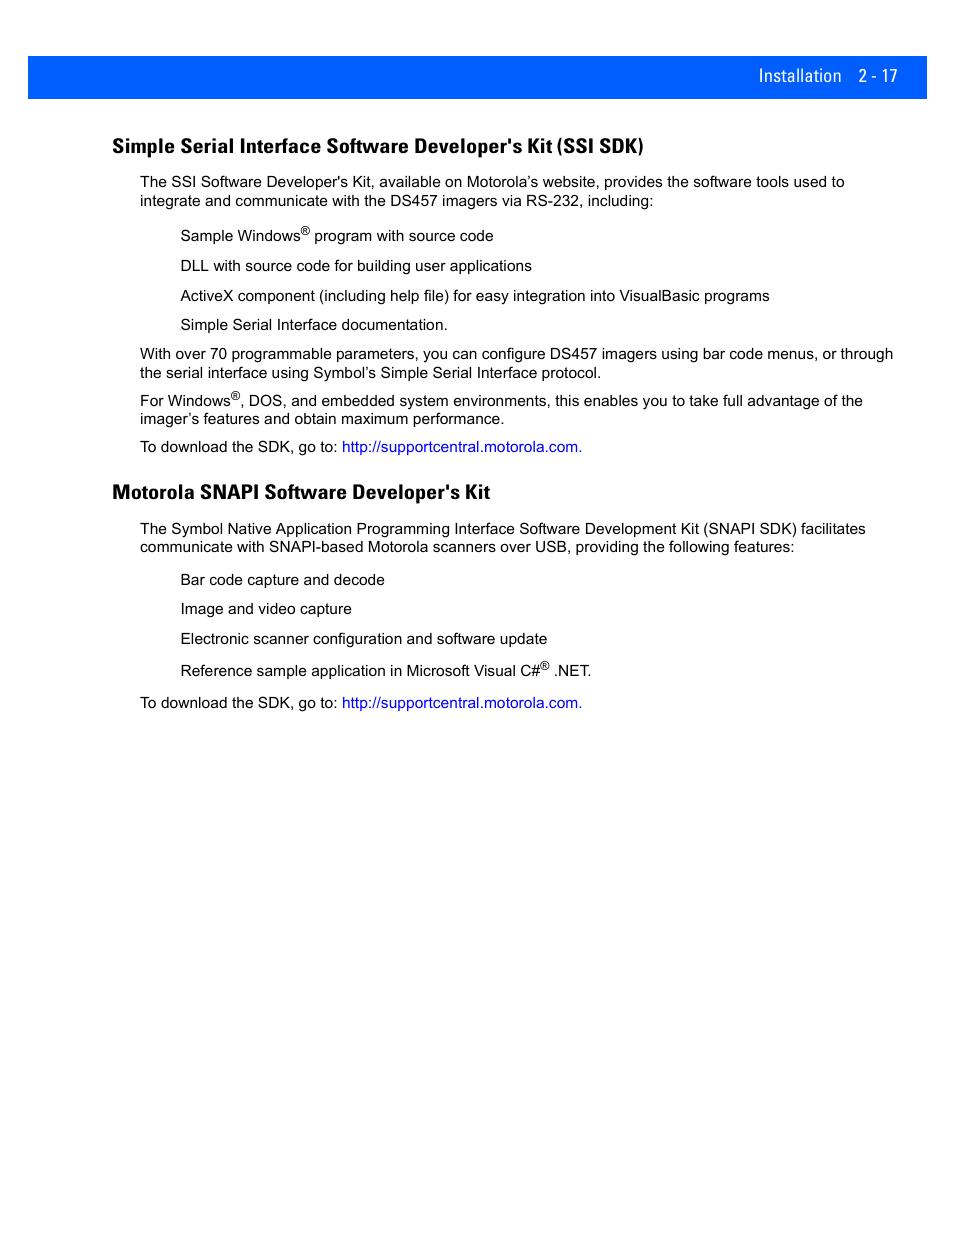 Motorola snapi software developer's kit, Motorola snapi software